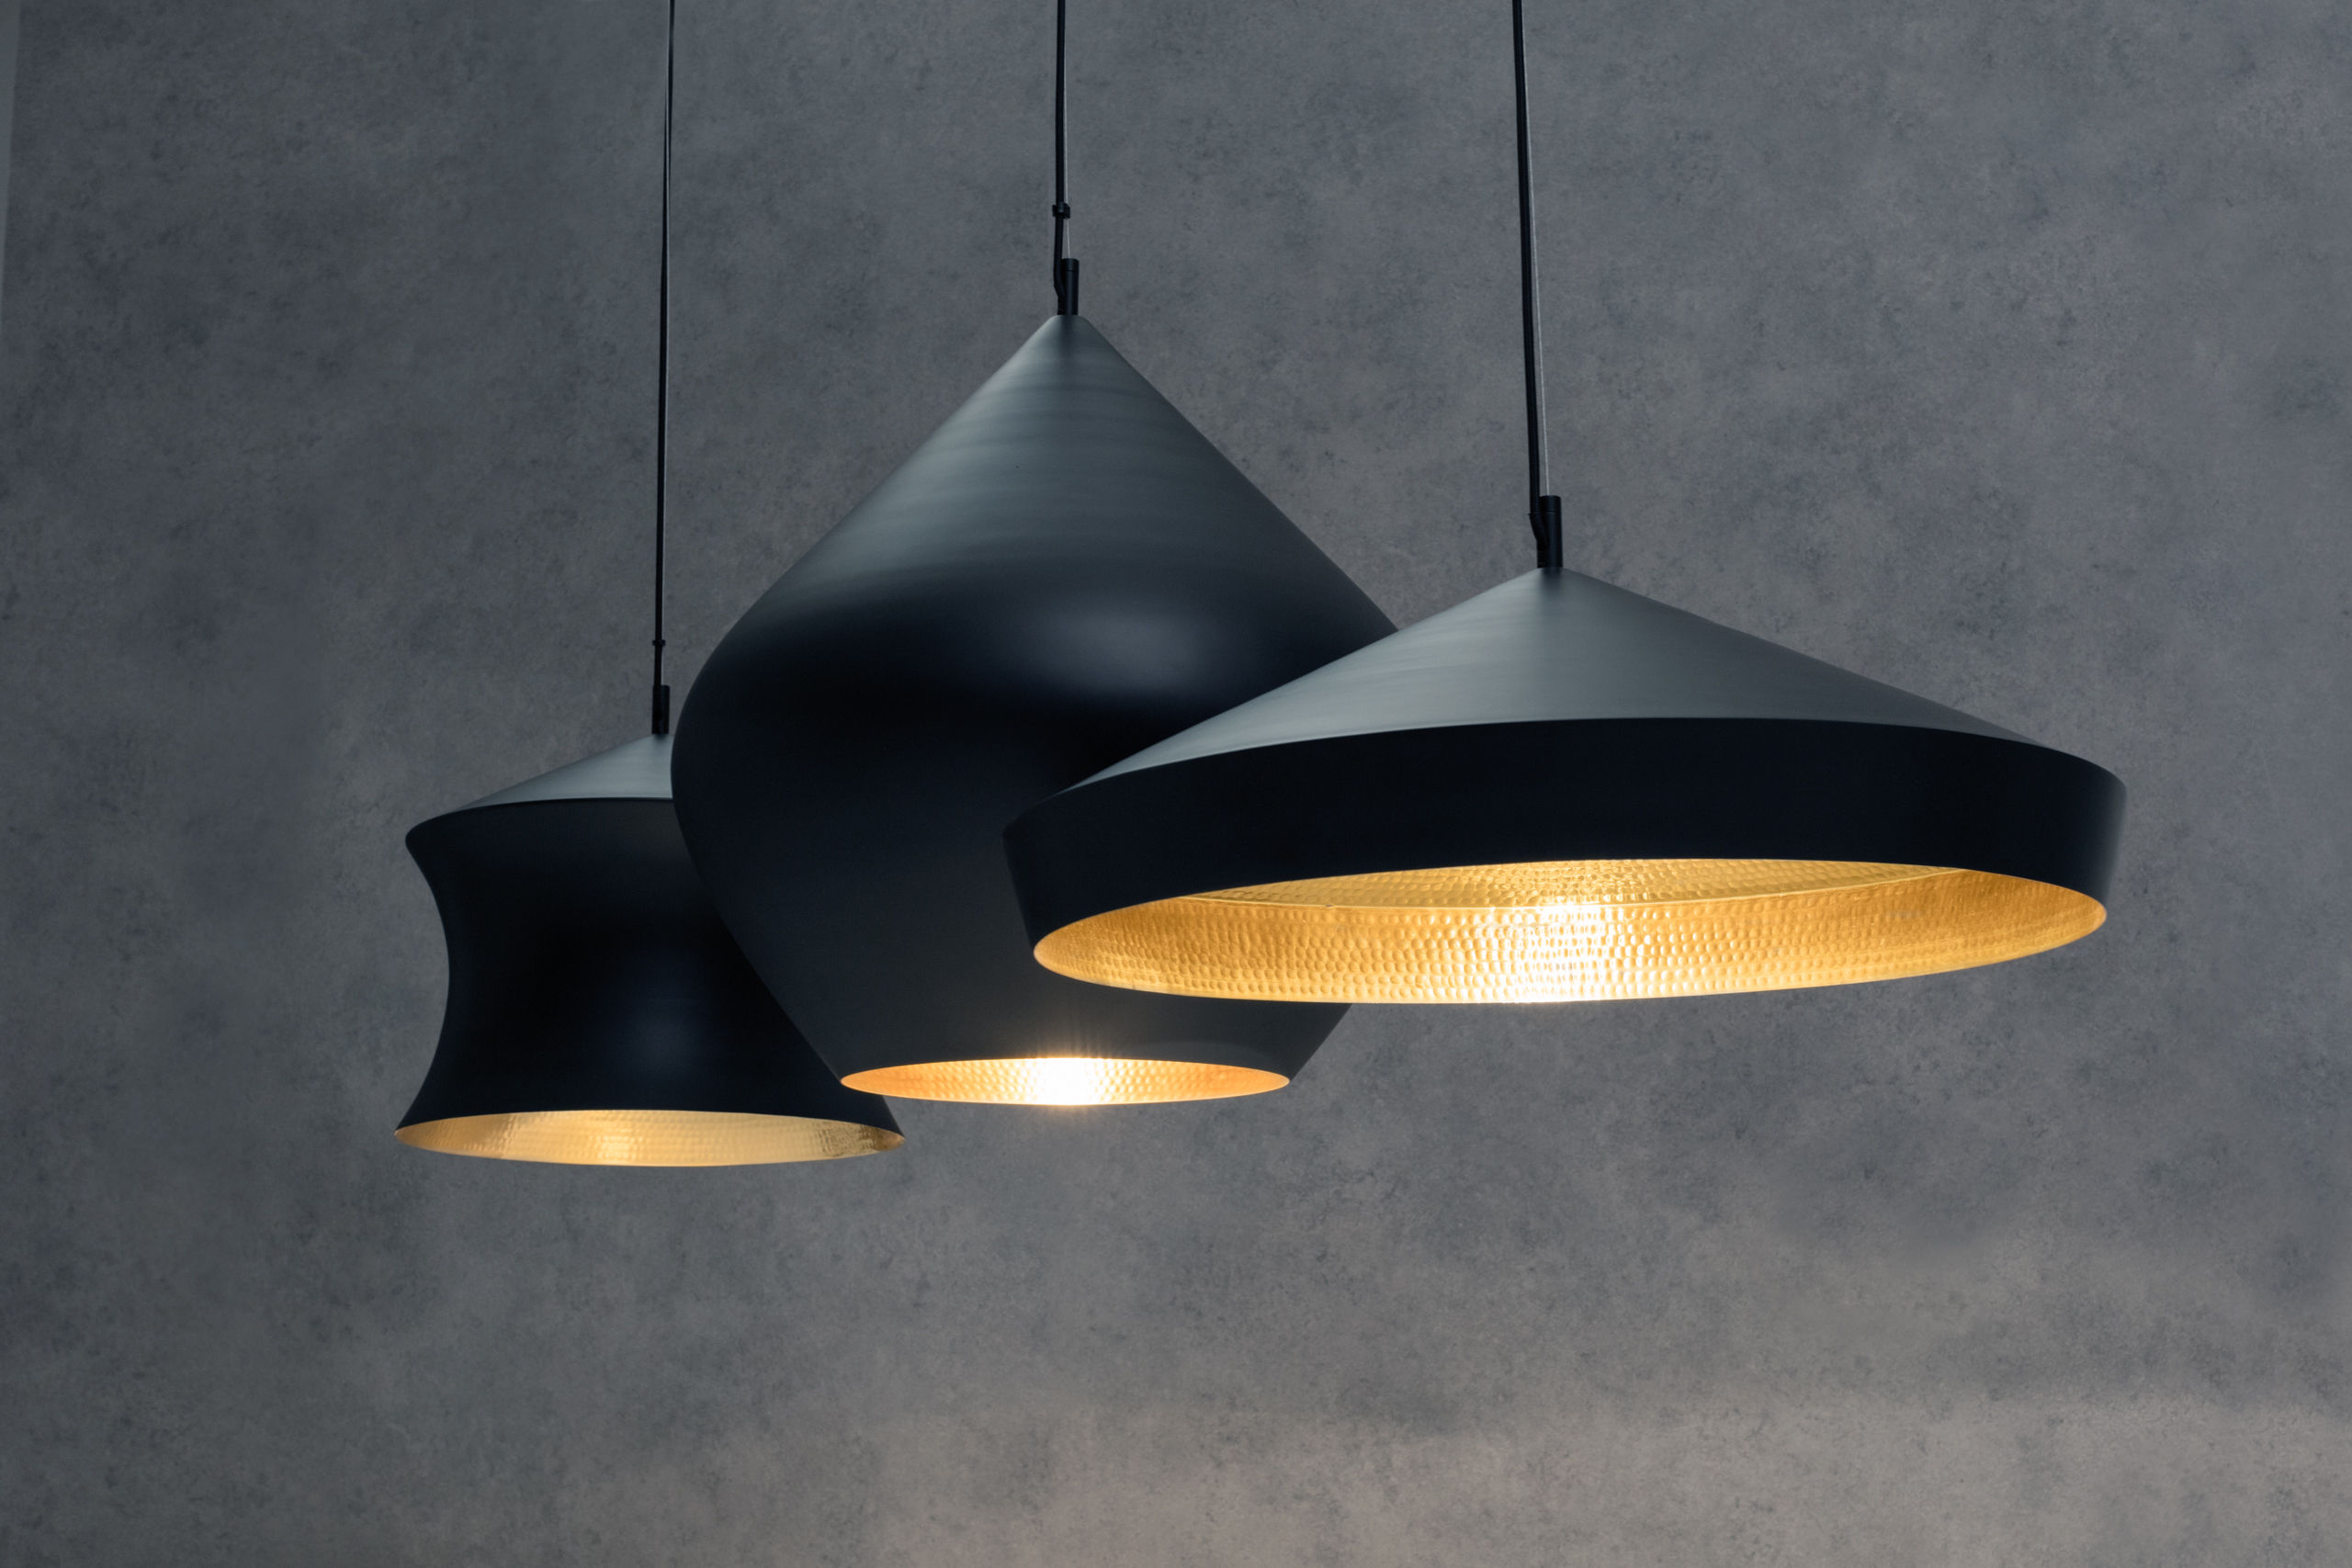 suspension beat flat 60 x h 20 cm noir int rieur dor tom dixon. Black Bedroom Furniture Sets. Home Design Ideas